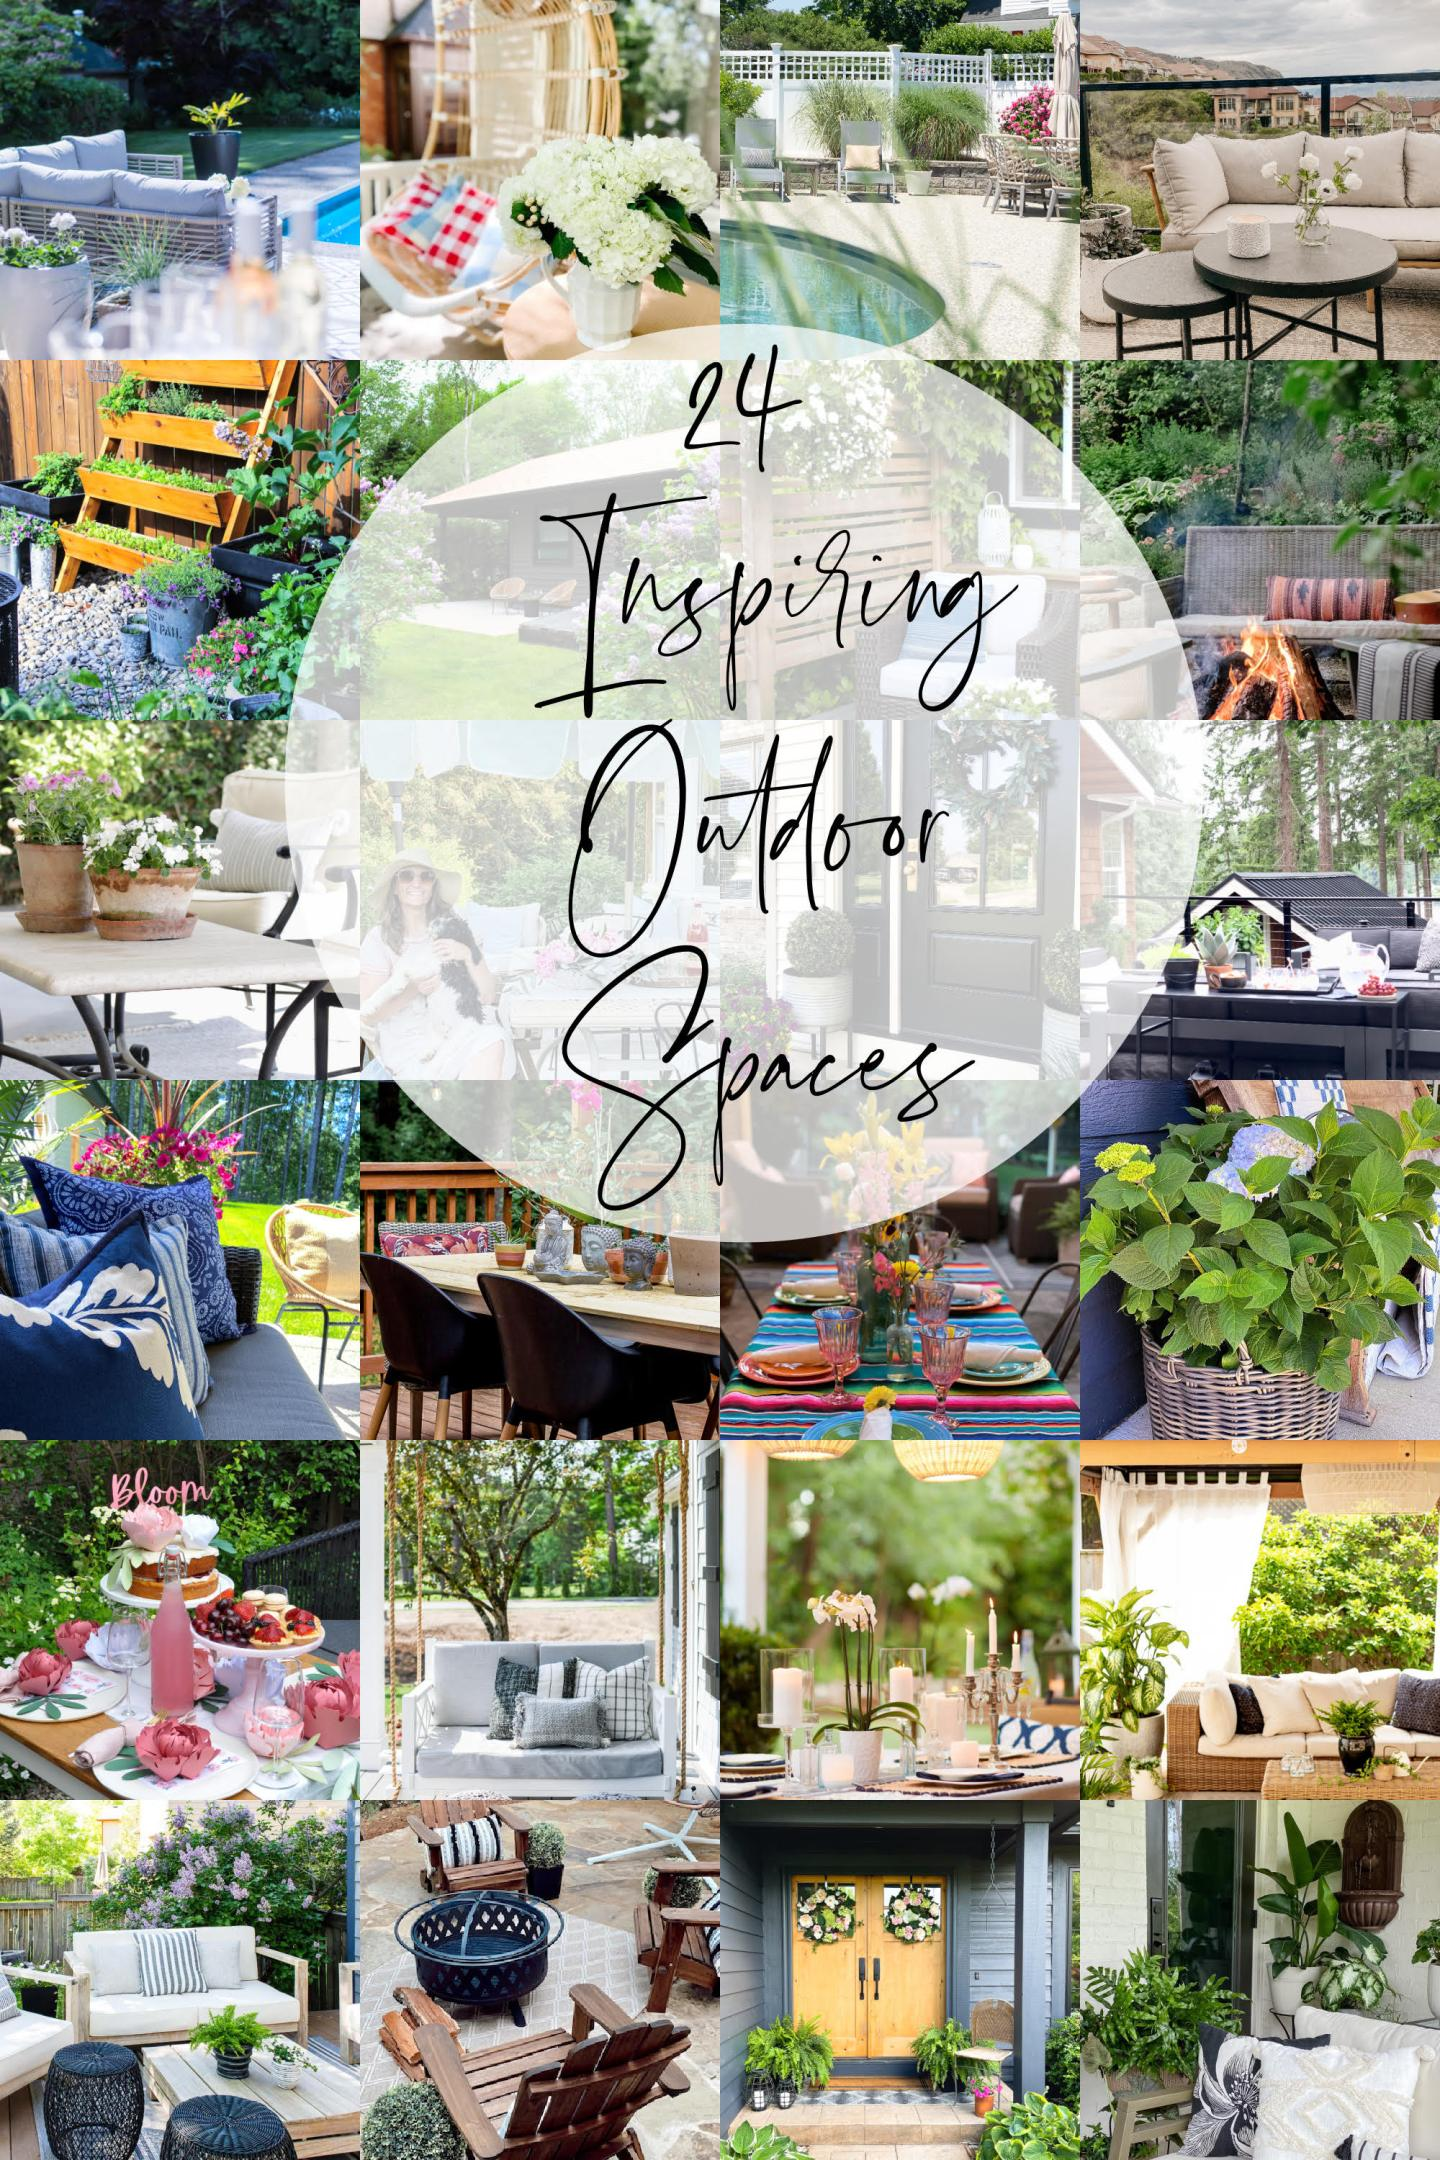 24 Inspiring Outdoor Spaces Tour